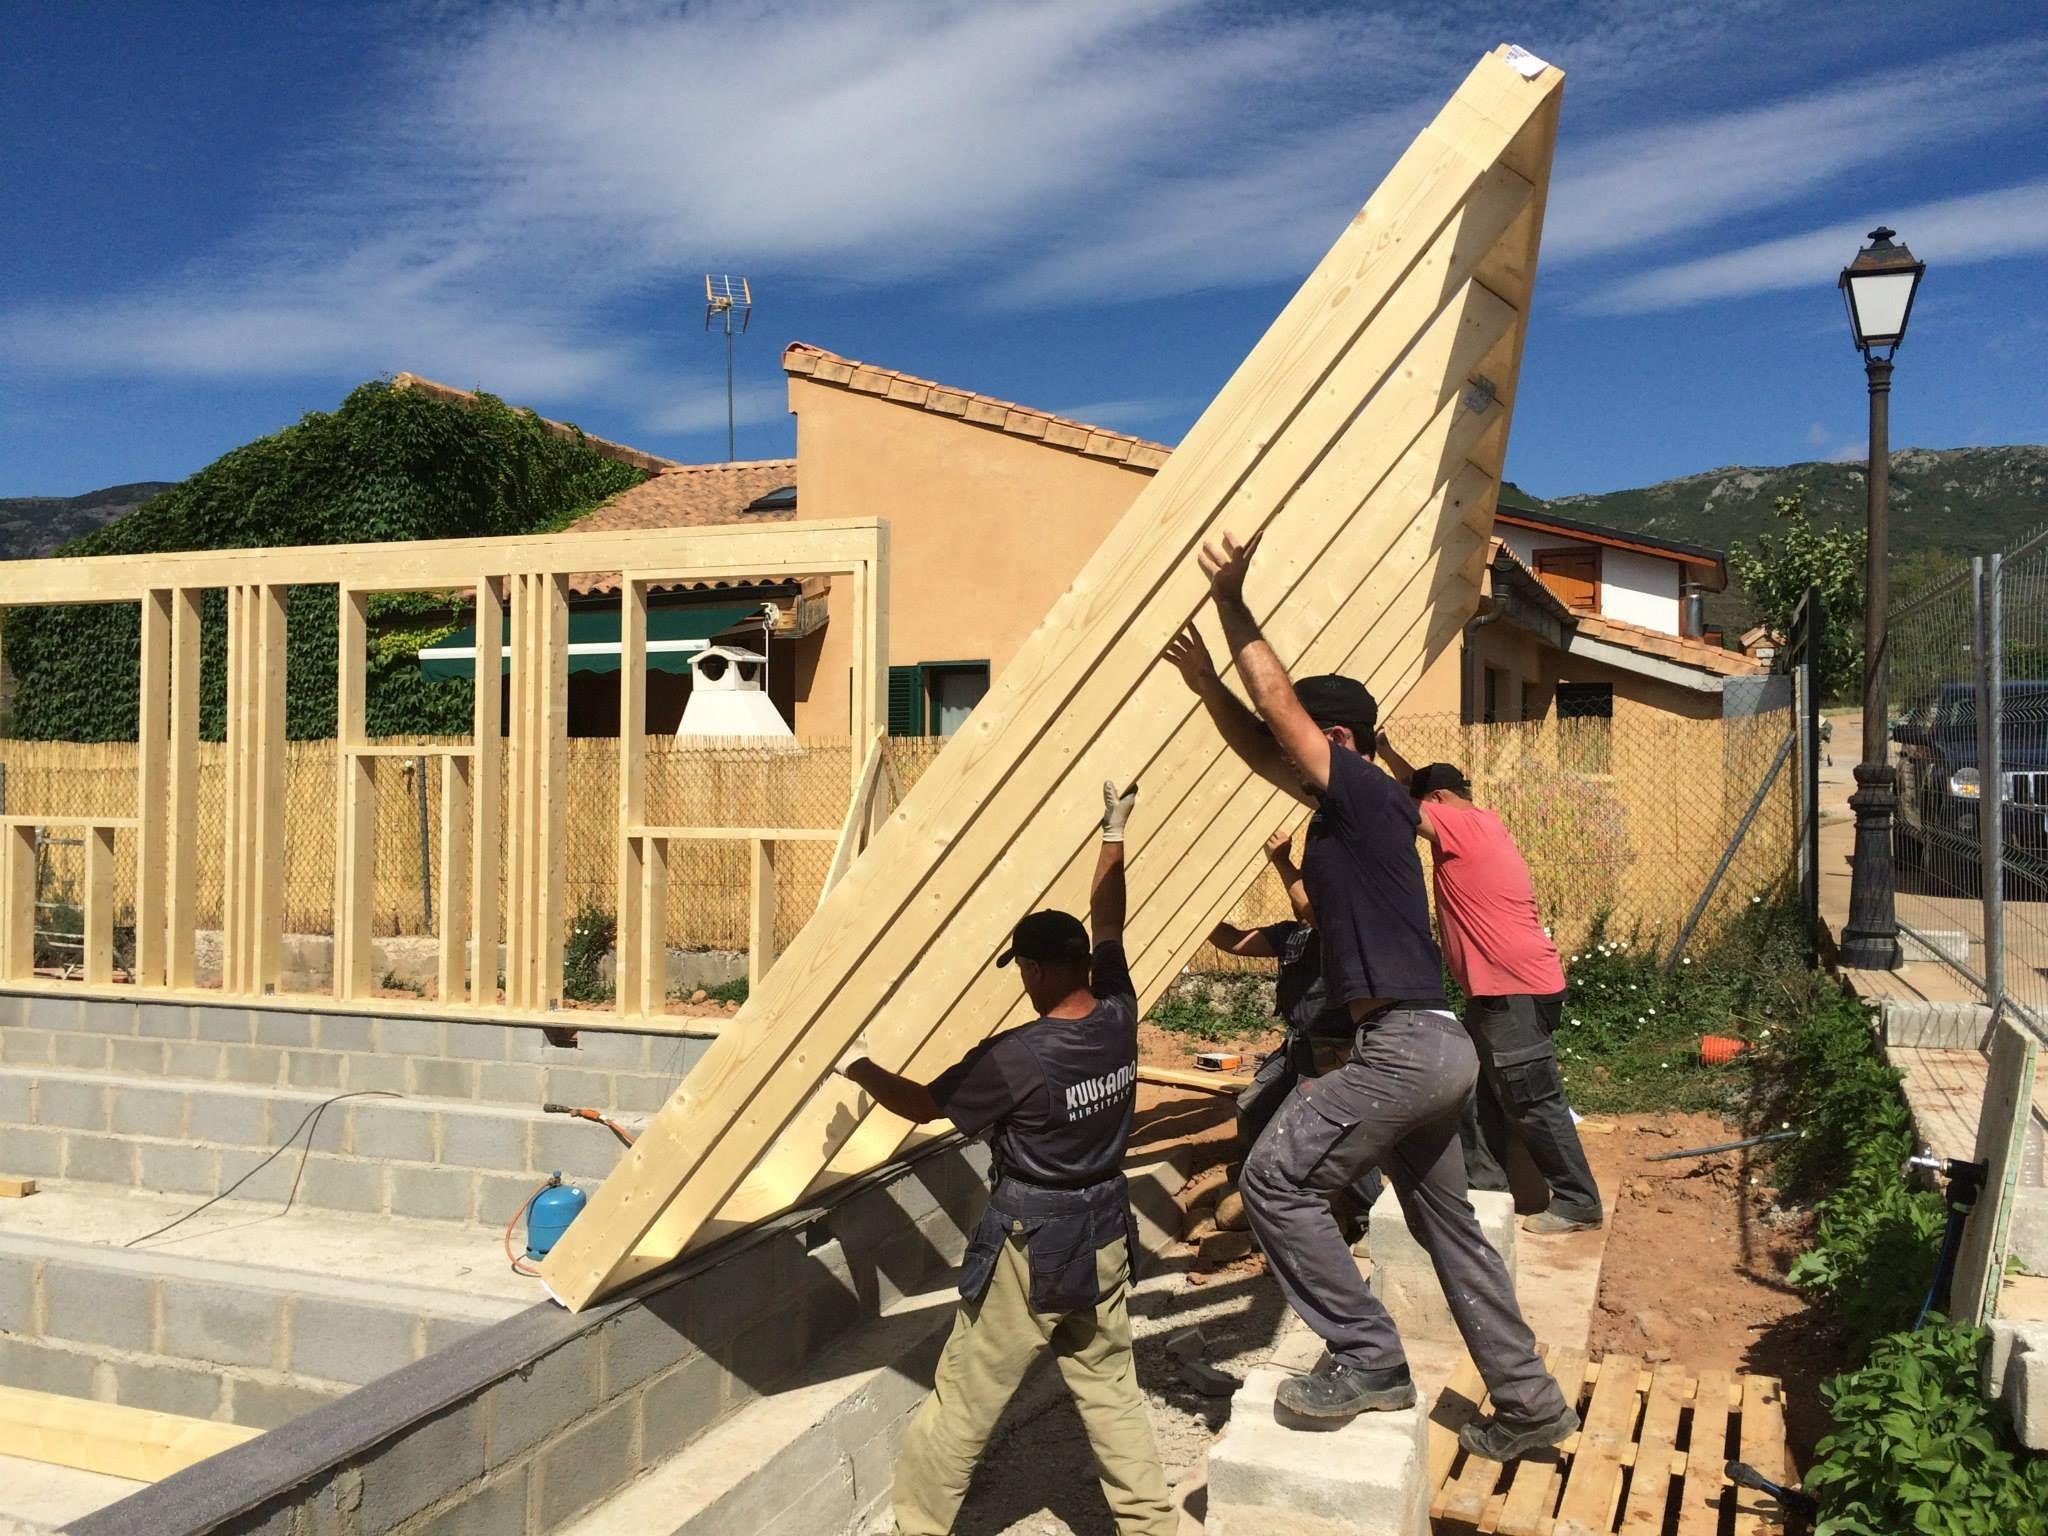 Izando muro de fachada casa con estructura de madera - Estructura casa madera ...